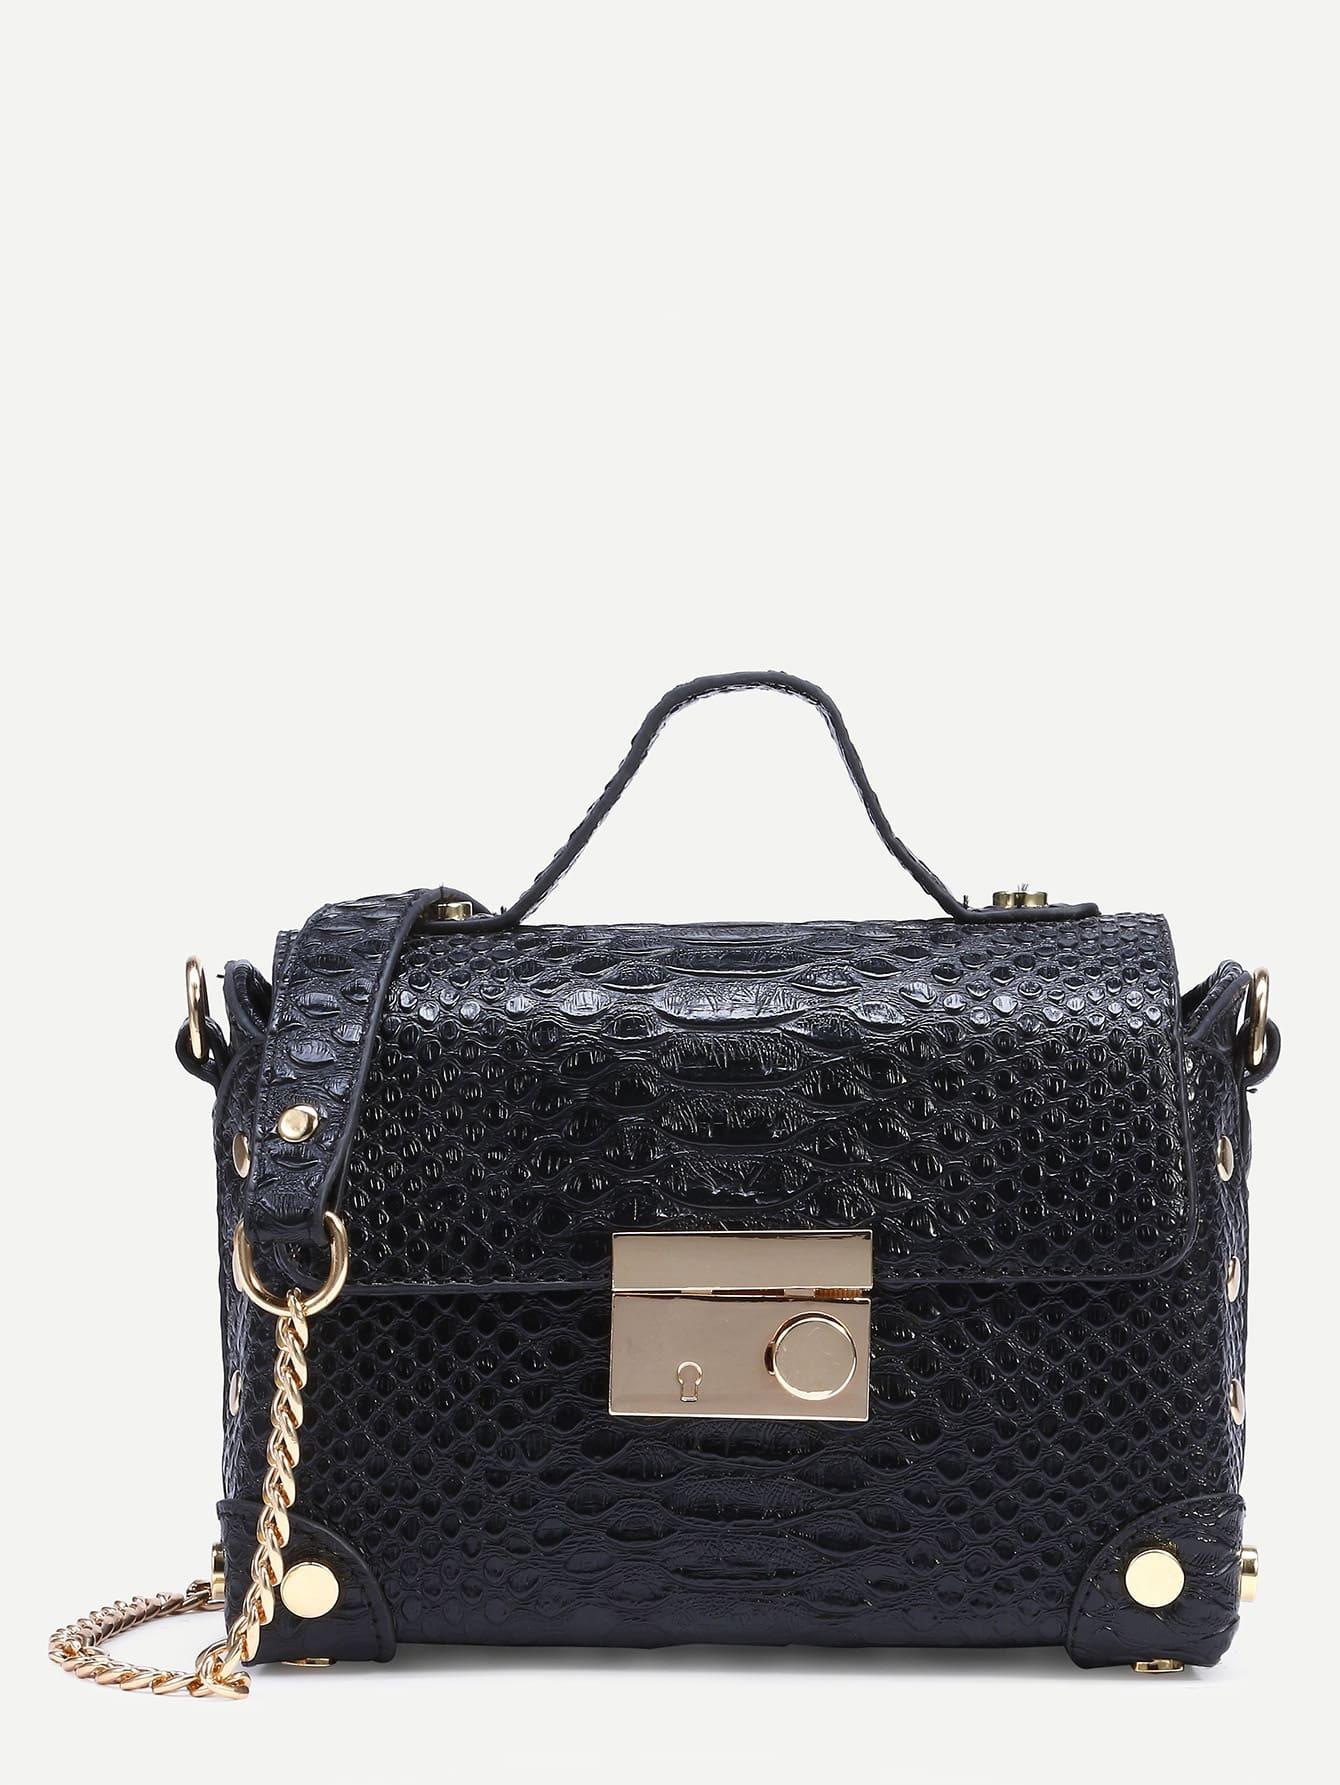 Black Crocodile Embossed Box Bag With Chain StrapBlack Crocodile Embossed Box Bag With Chain Strap<br><br>color: Black<br>size: None